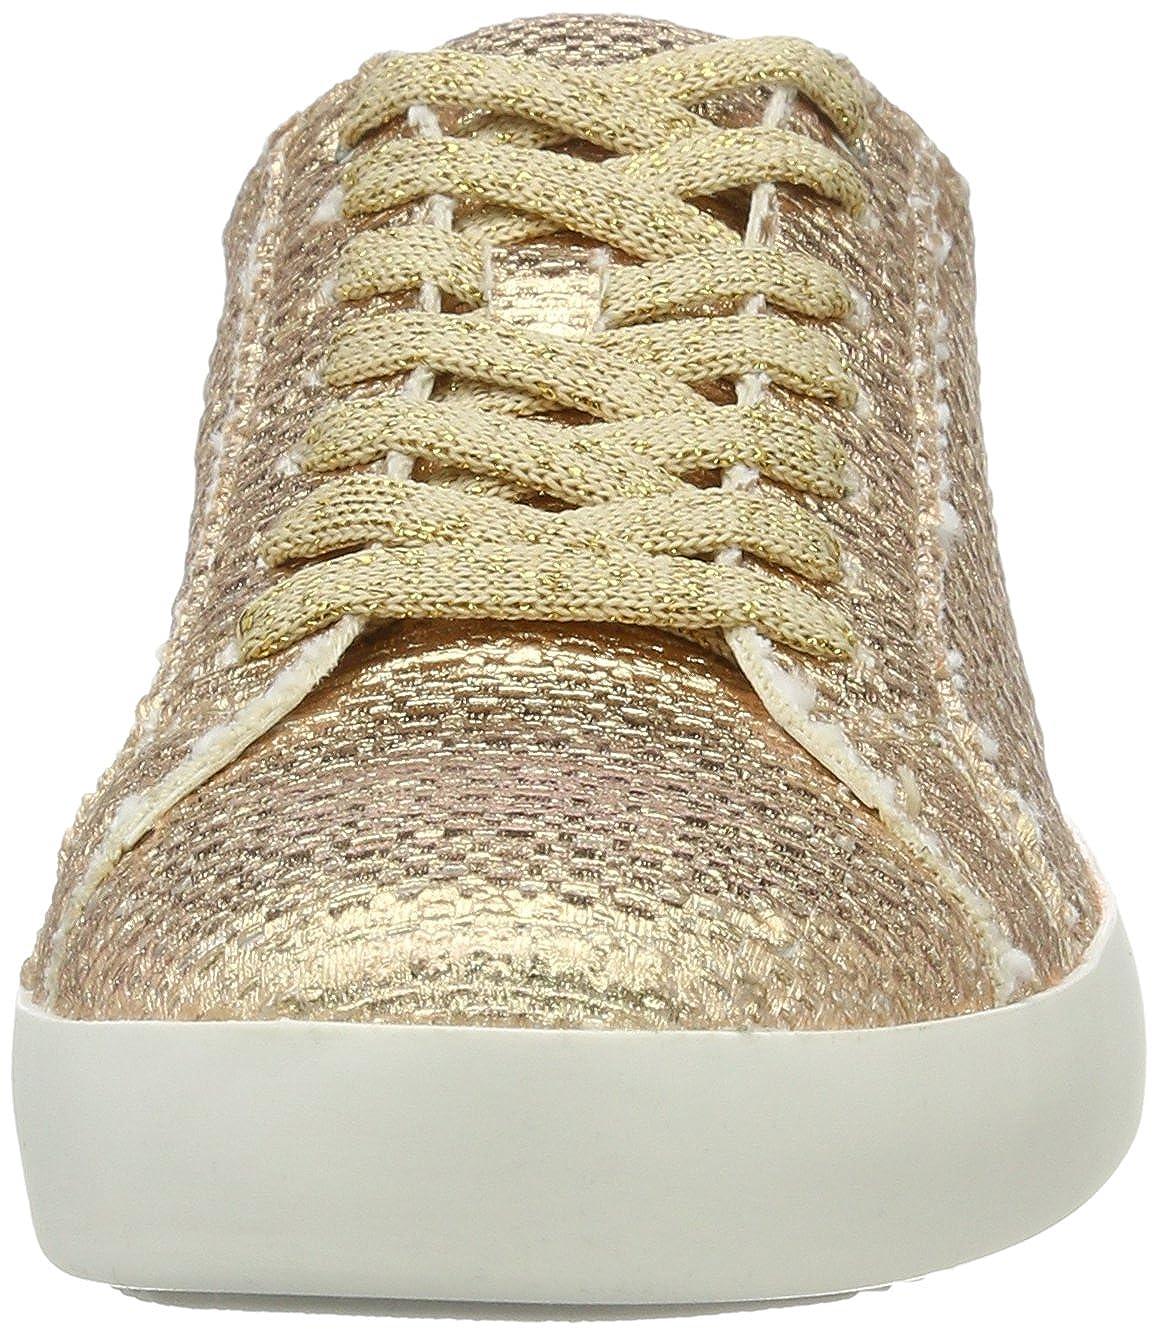 Tamaris Damen 23635 Sneakers Gold 952) (Rose Metallic 952) Gold 4b0ecb